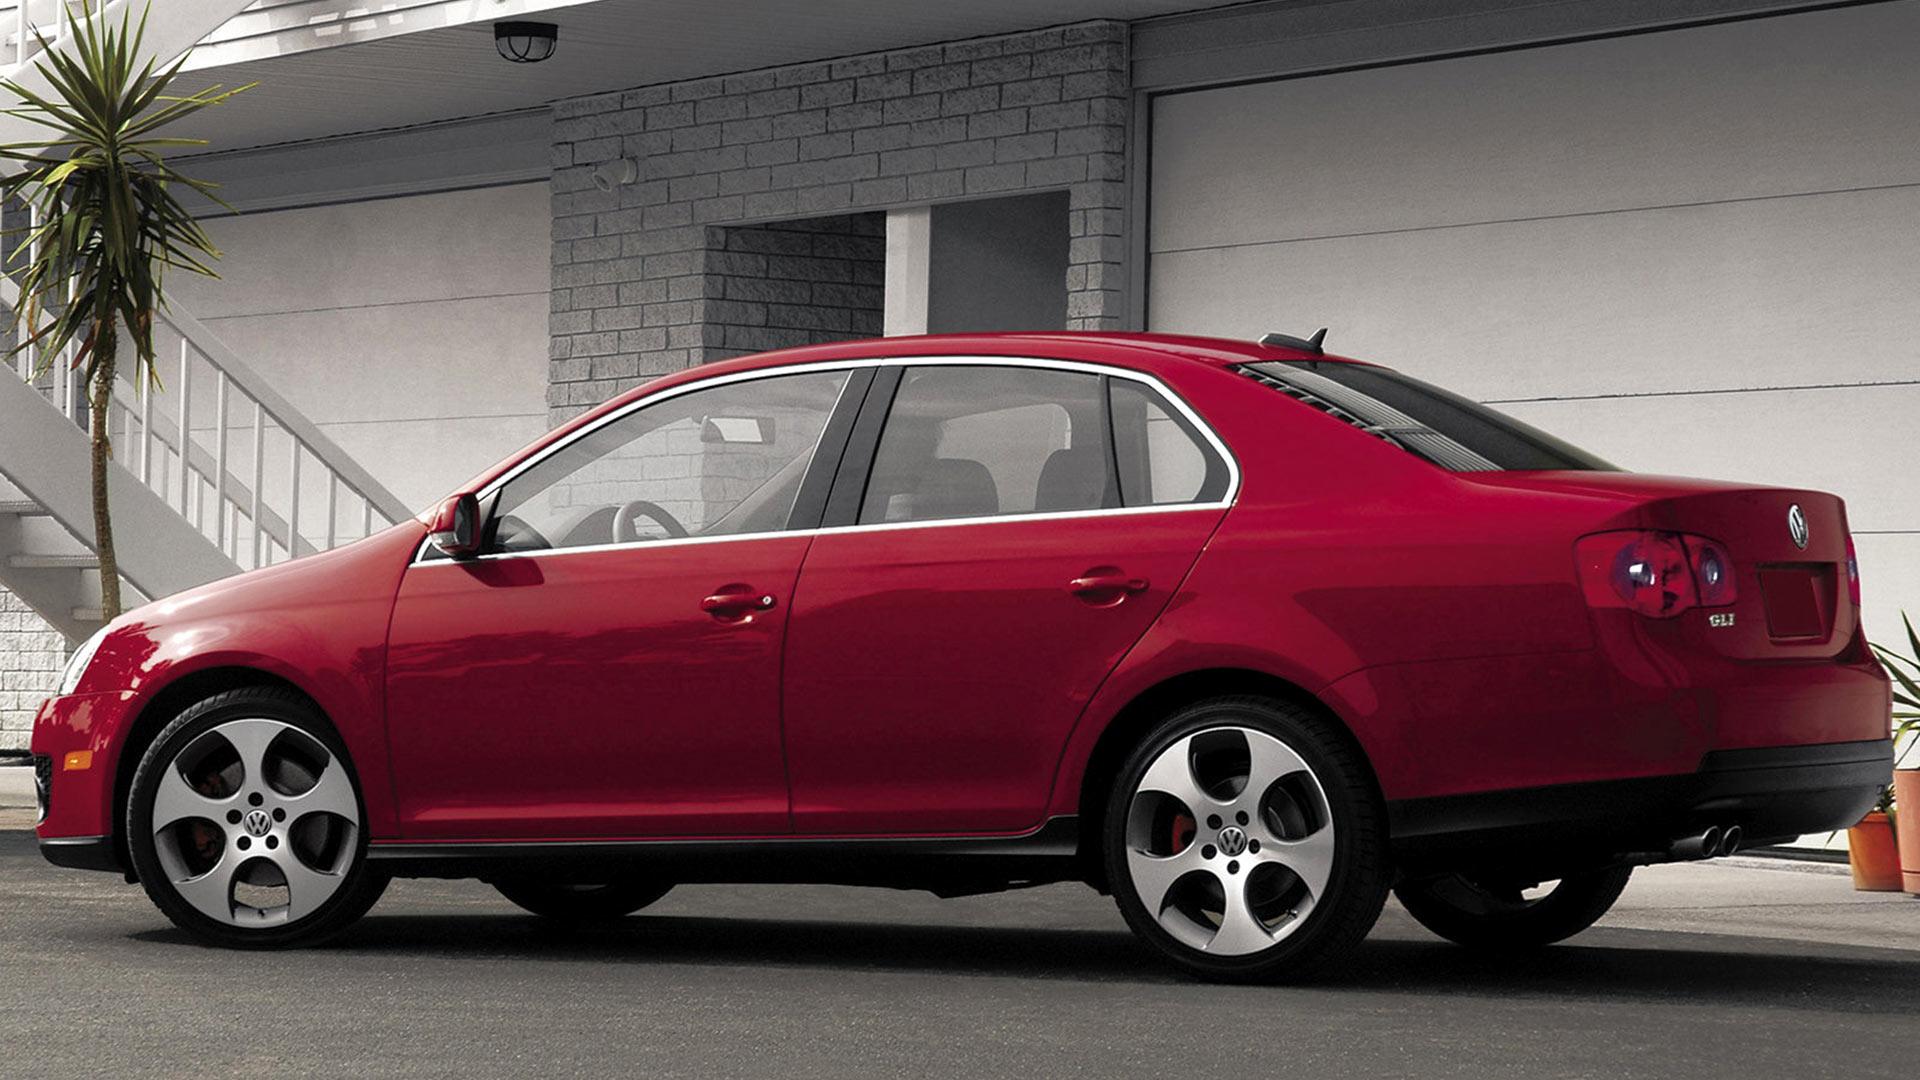 Jetta Gli The Fast Volkswagen European Buyers Forgot About Motoring Research